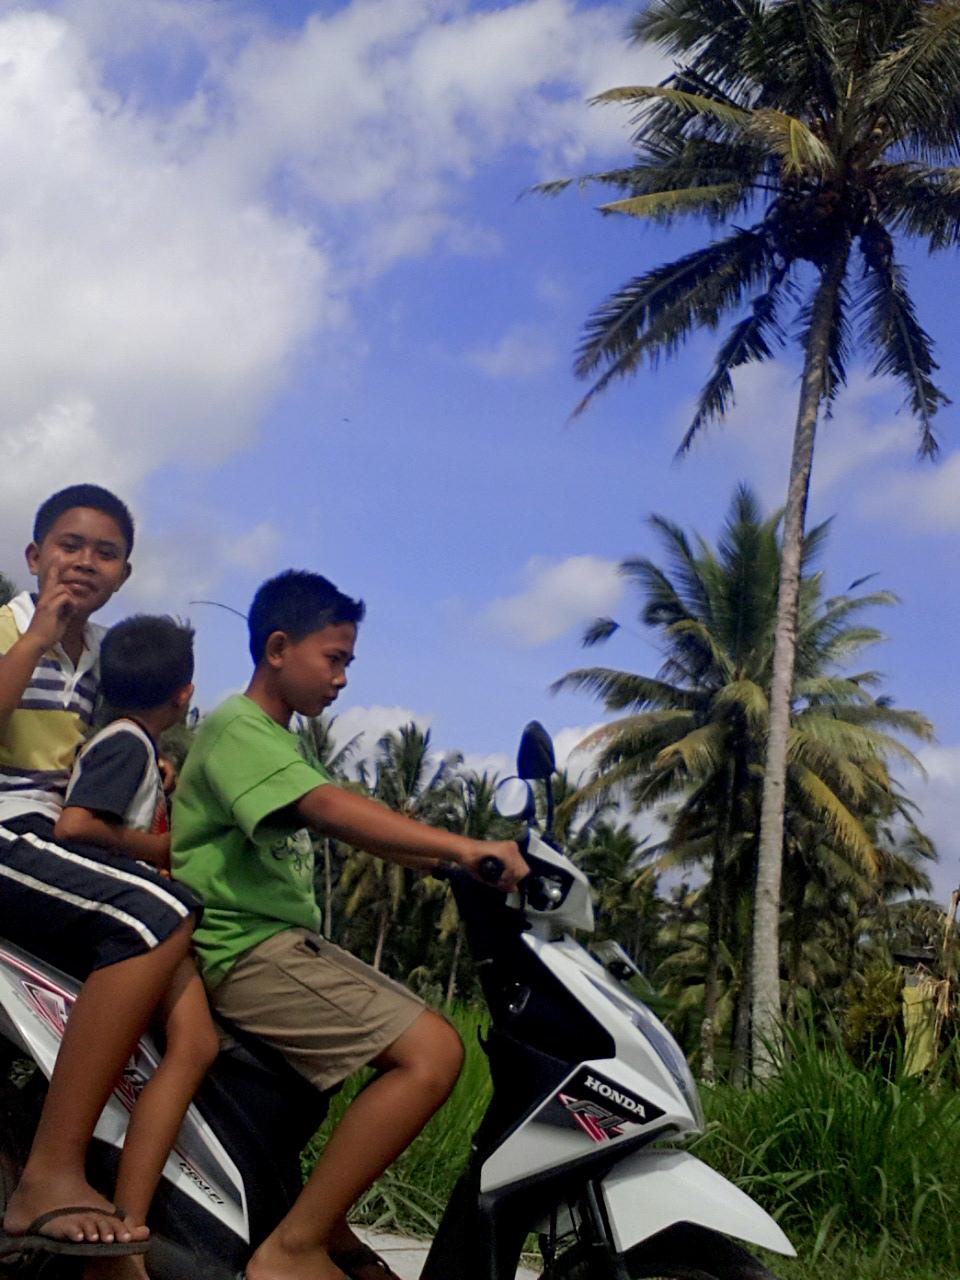 Boys on scooter behind villa